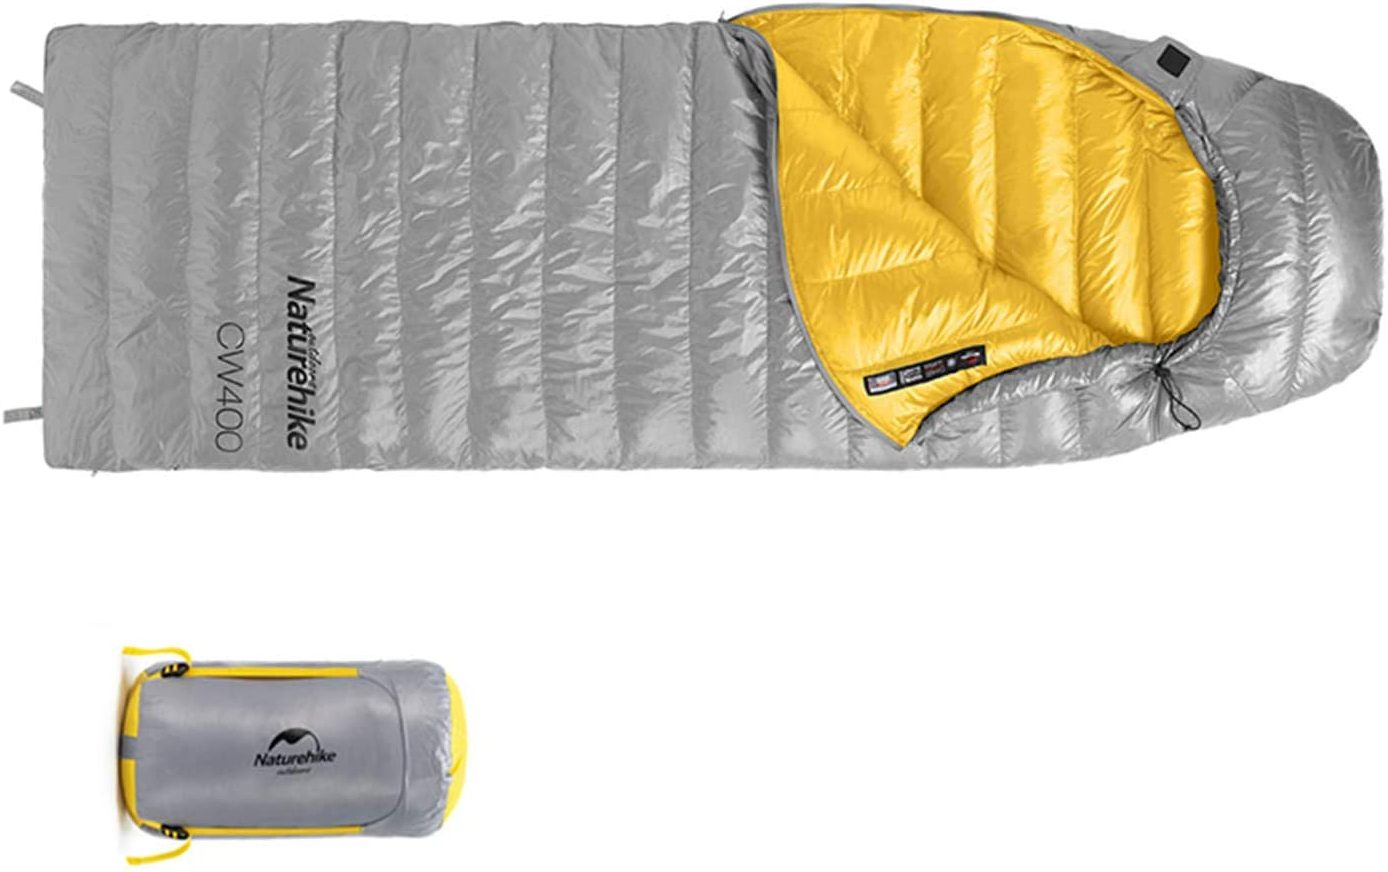 Naturehike ultralight goose down sleeping bag